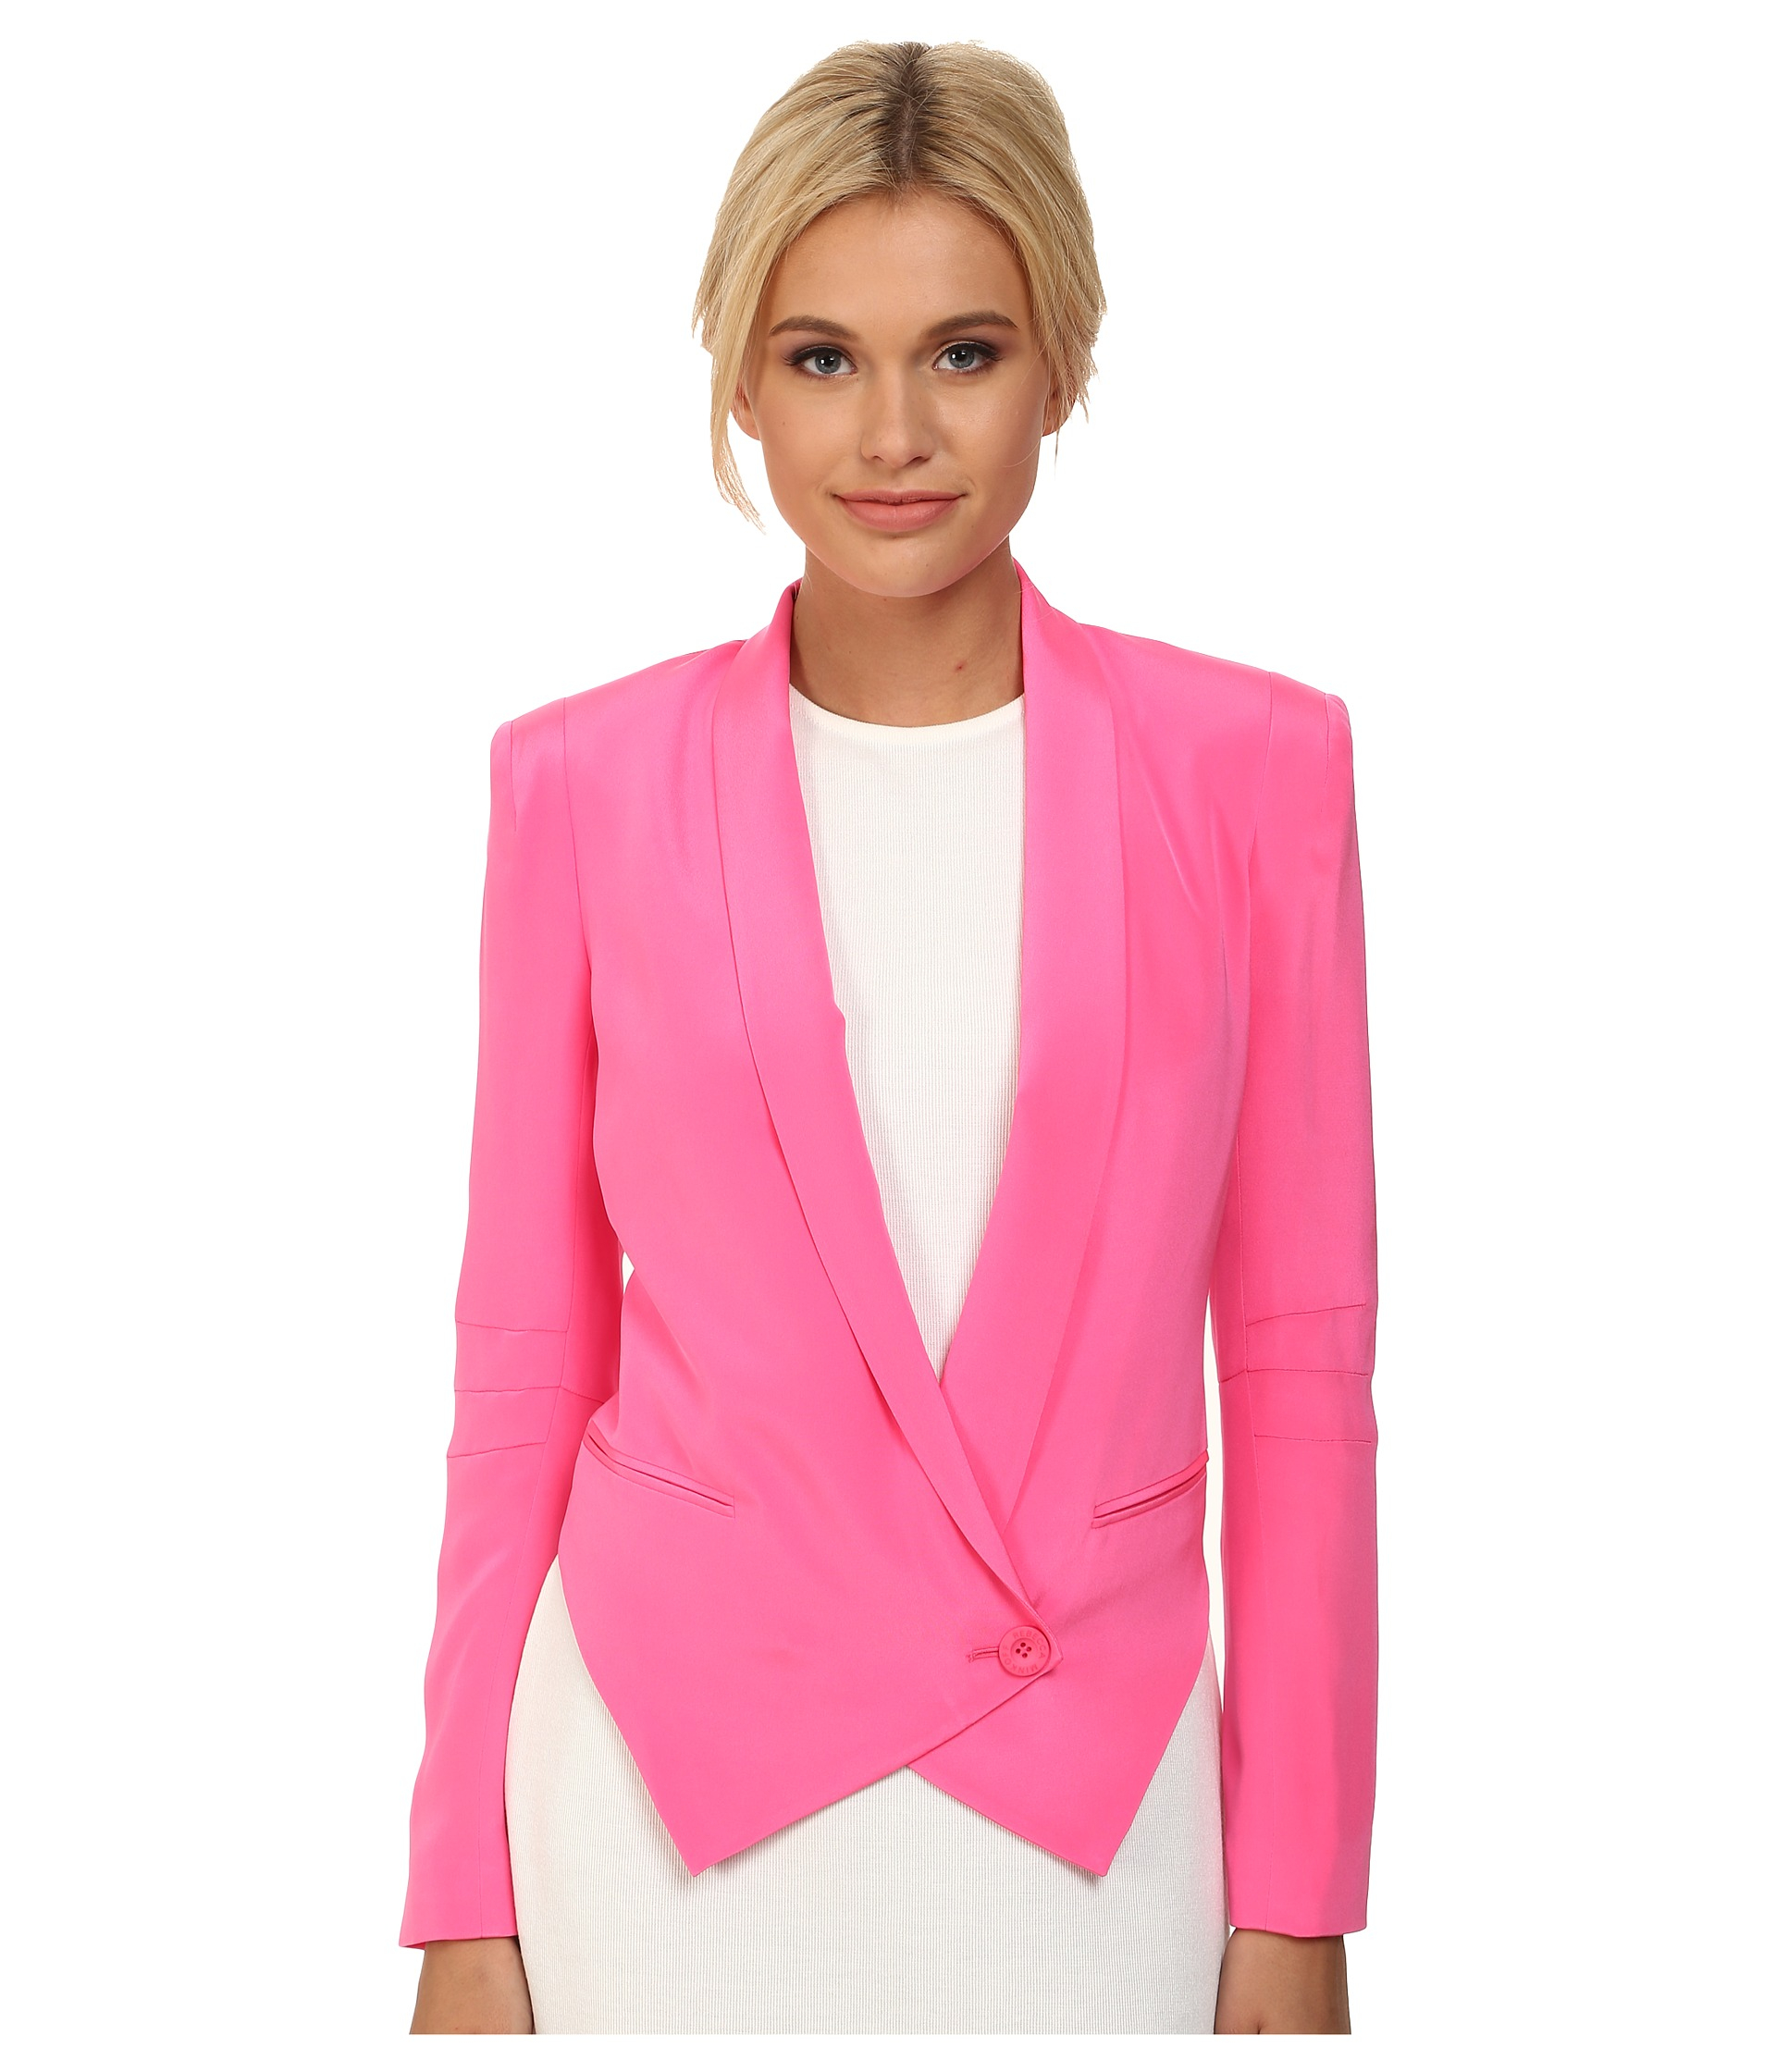 Lyst - Rebecca Minkoff Becky Jacket in Pink